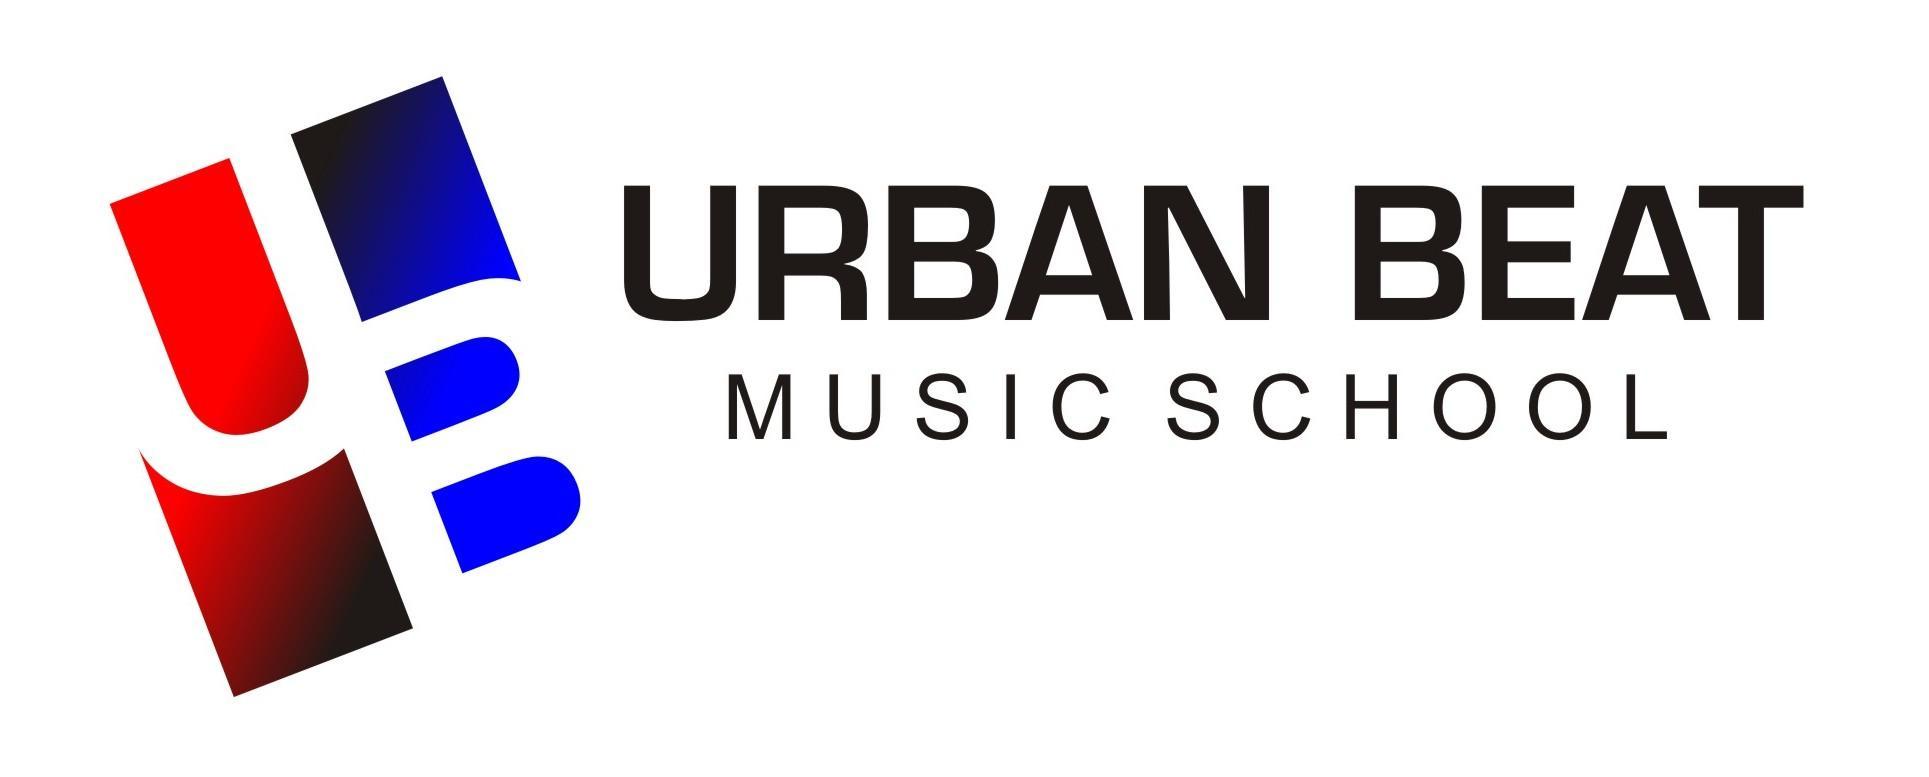 Urban Beat Music School